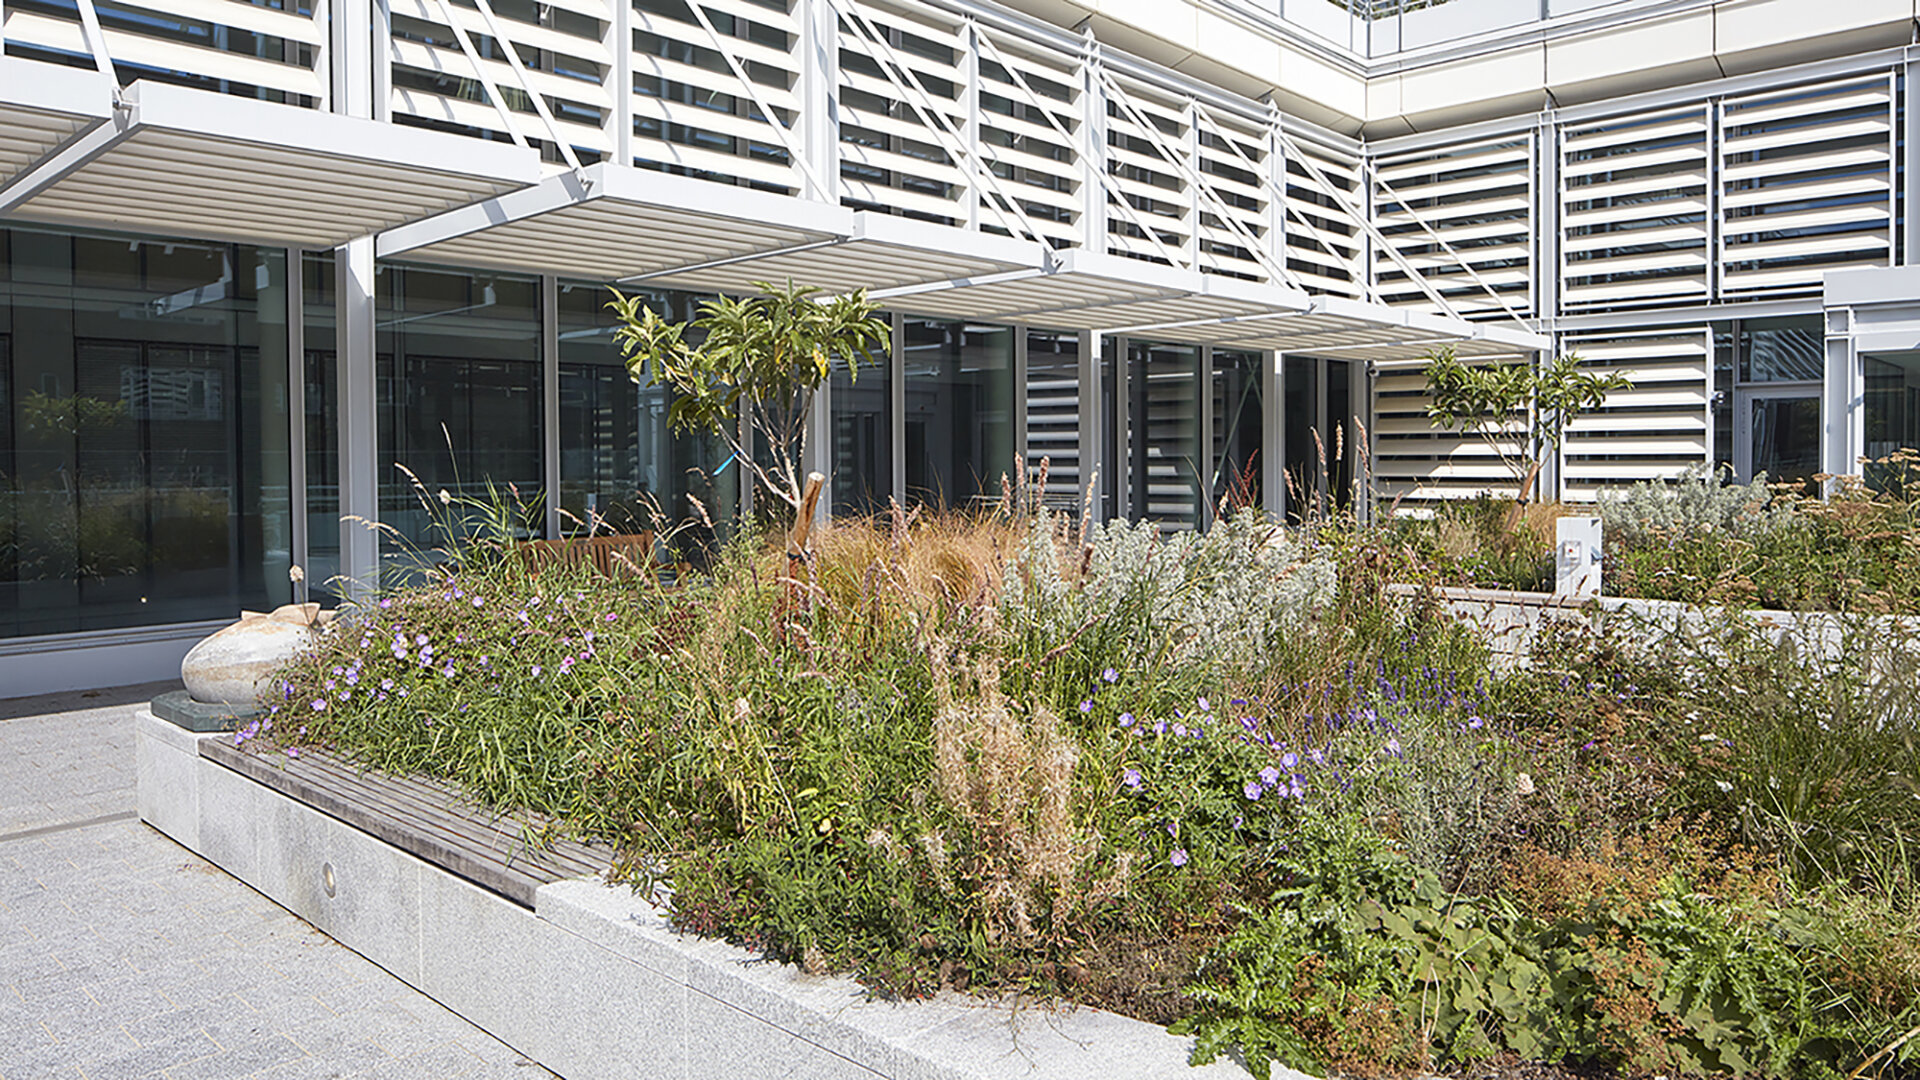 Grafton Way Building wins a British National Landscape Award